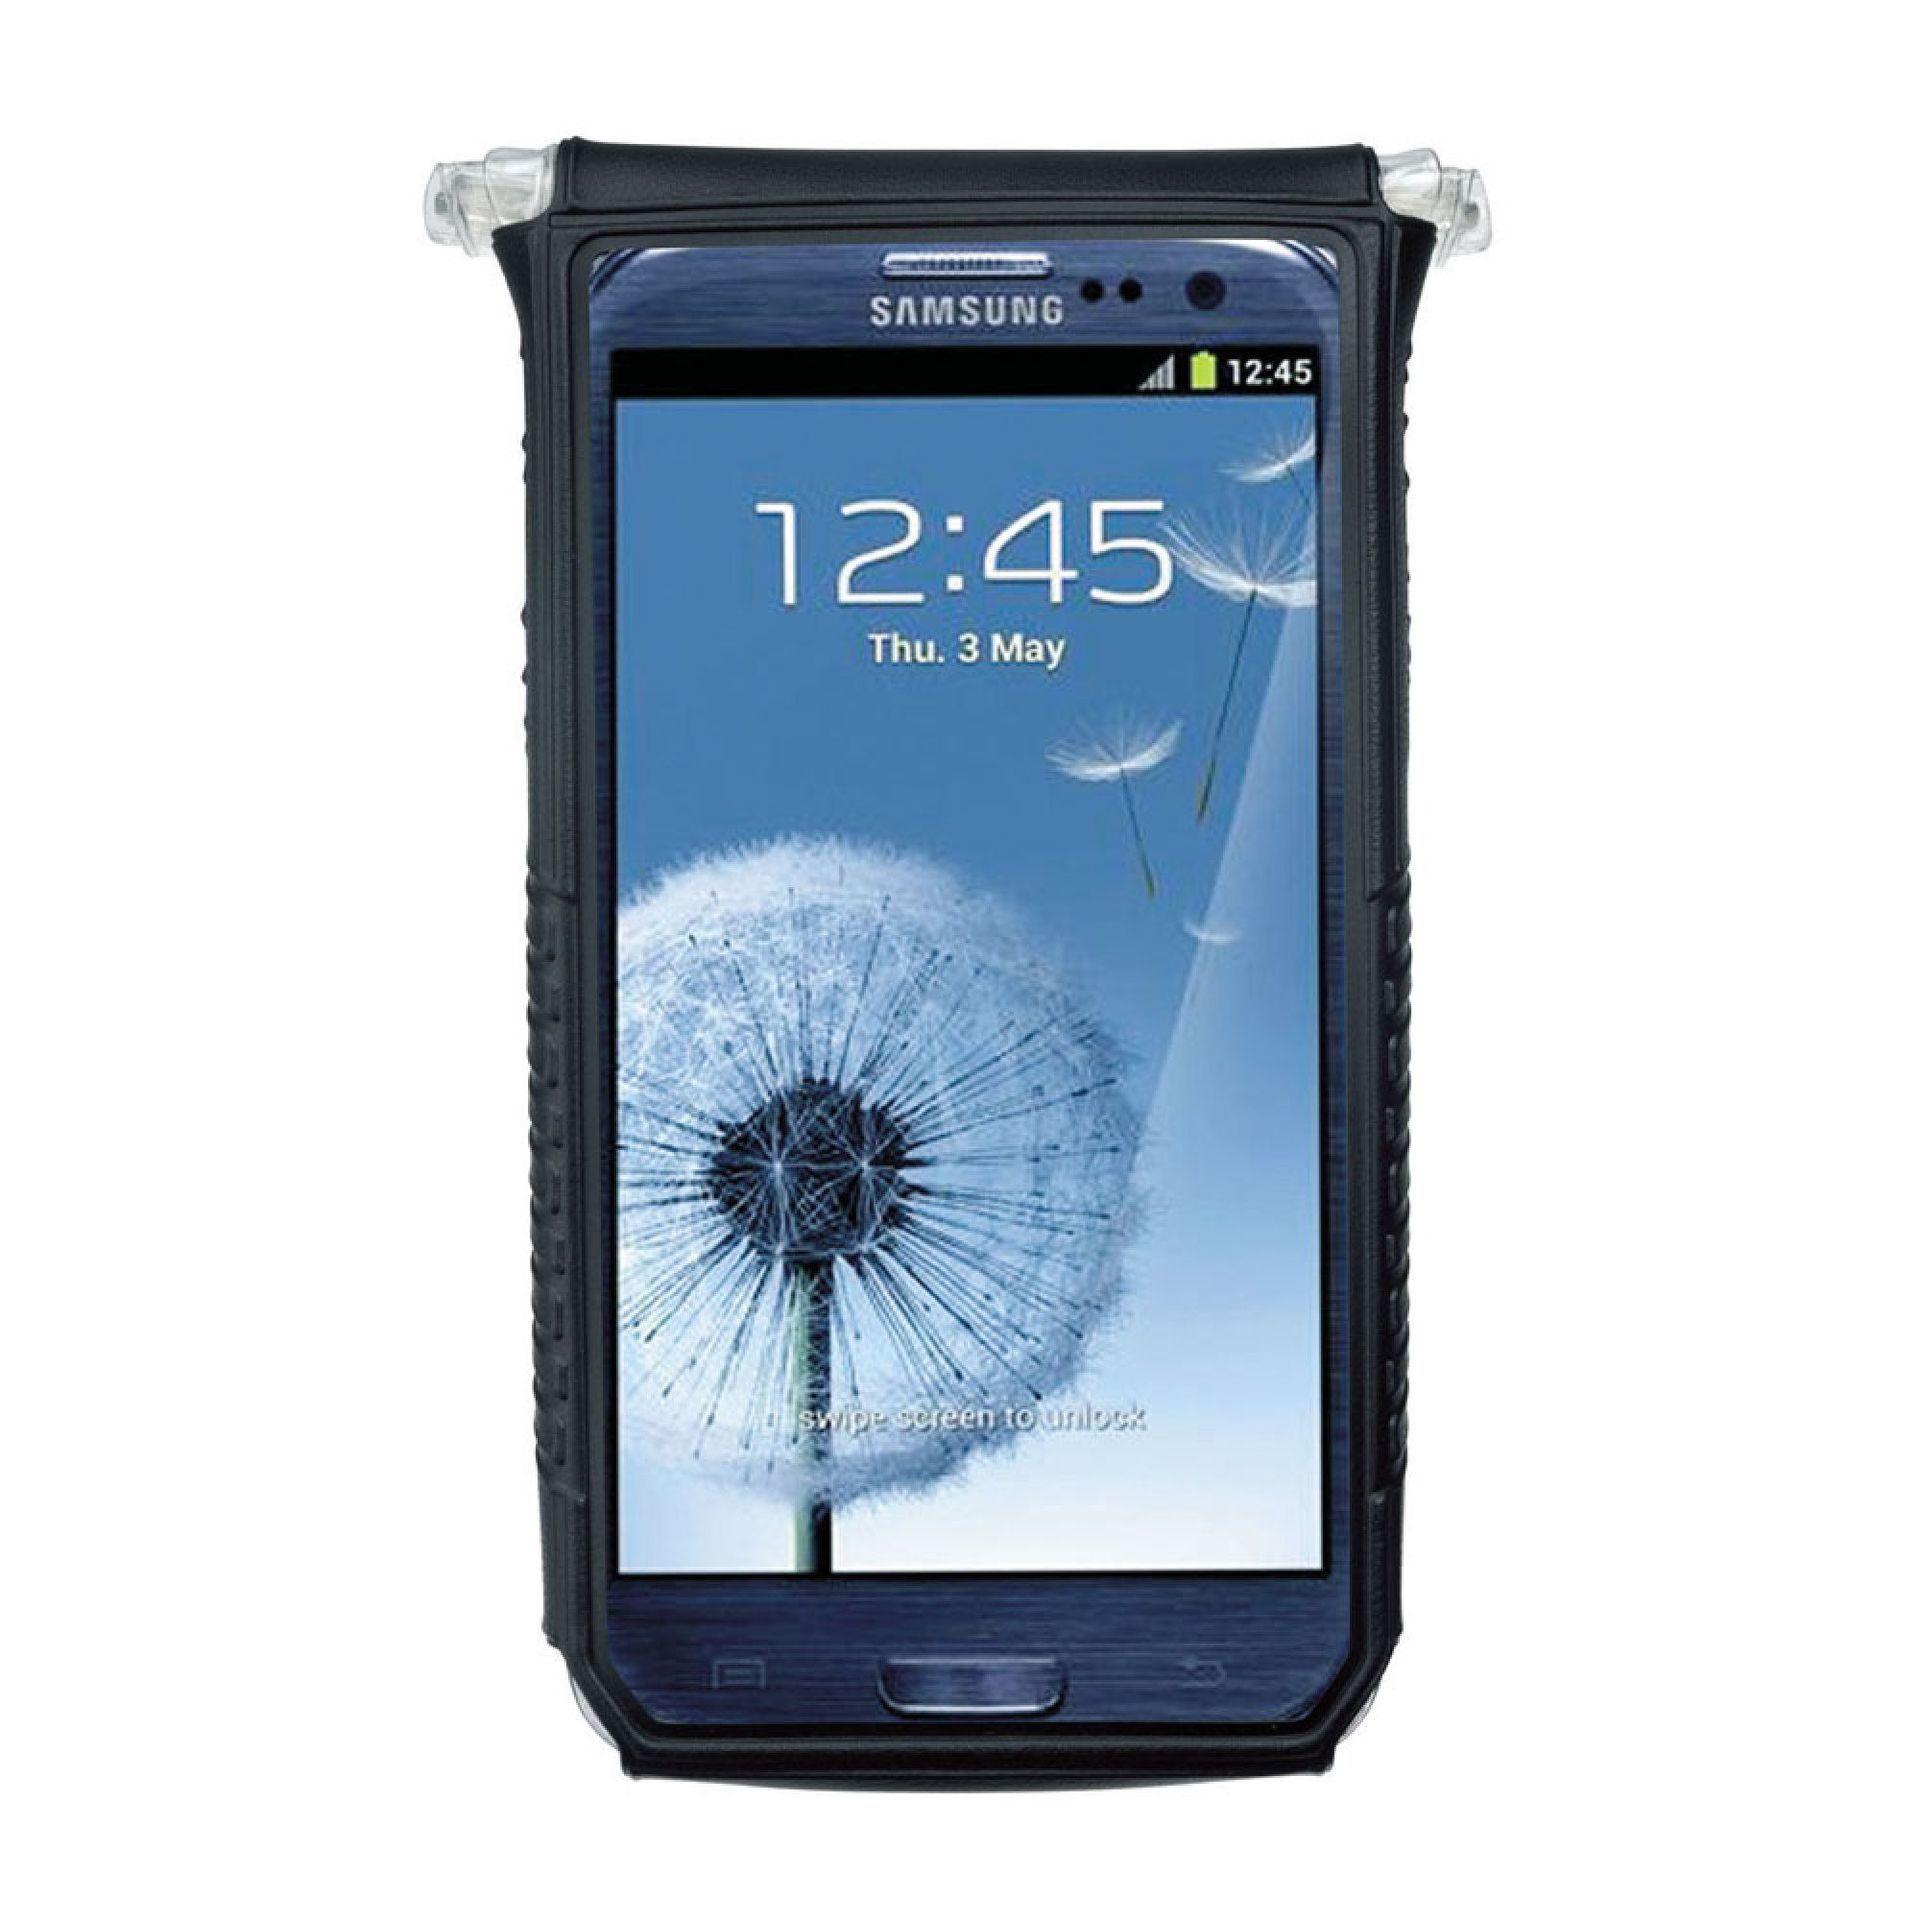 ROWEROWY POKROWIEC NA SMARTPHONA TOPEAK SMARTPHONE DRYBAG 5 BLACK I